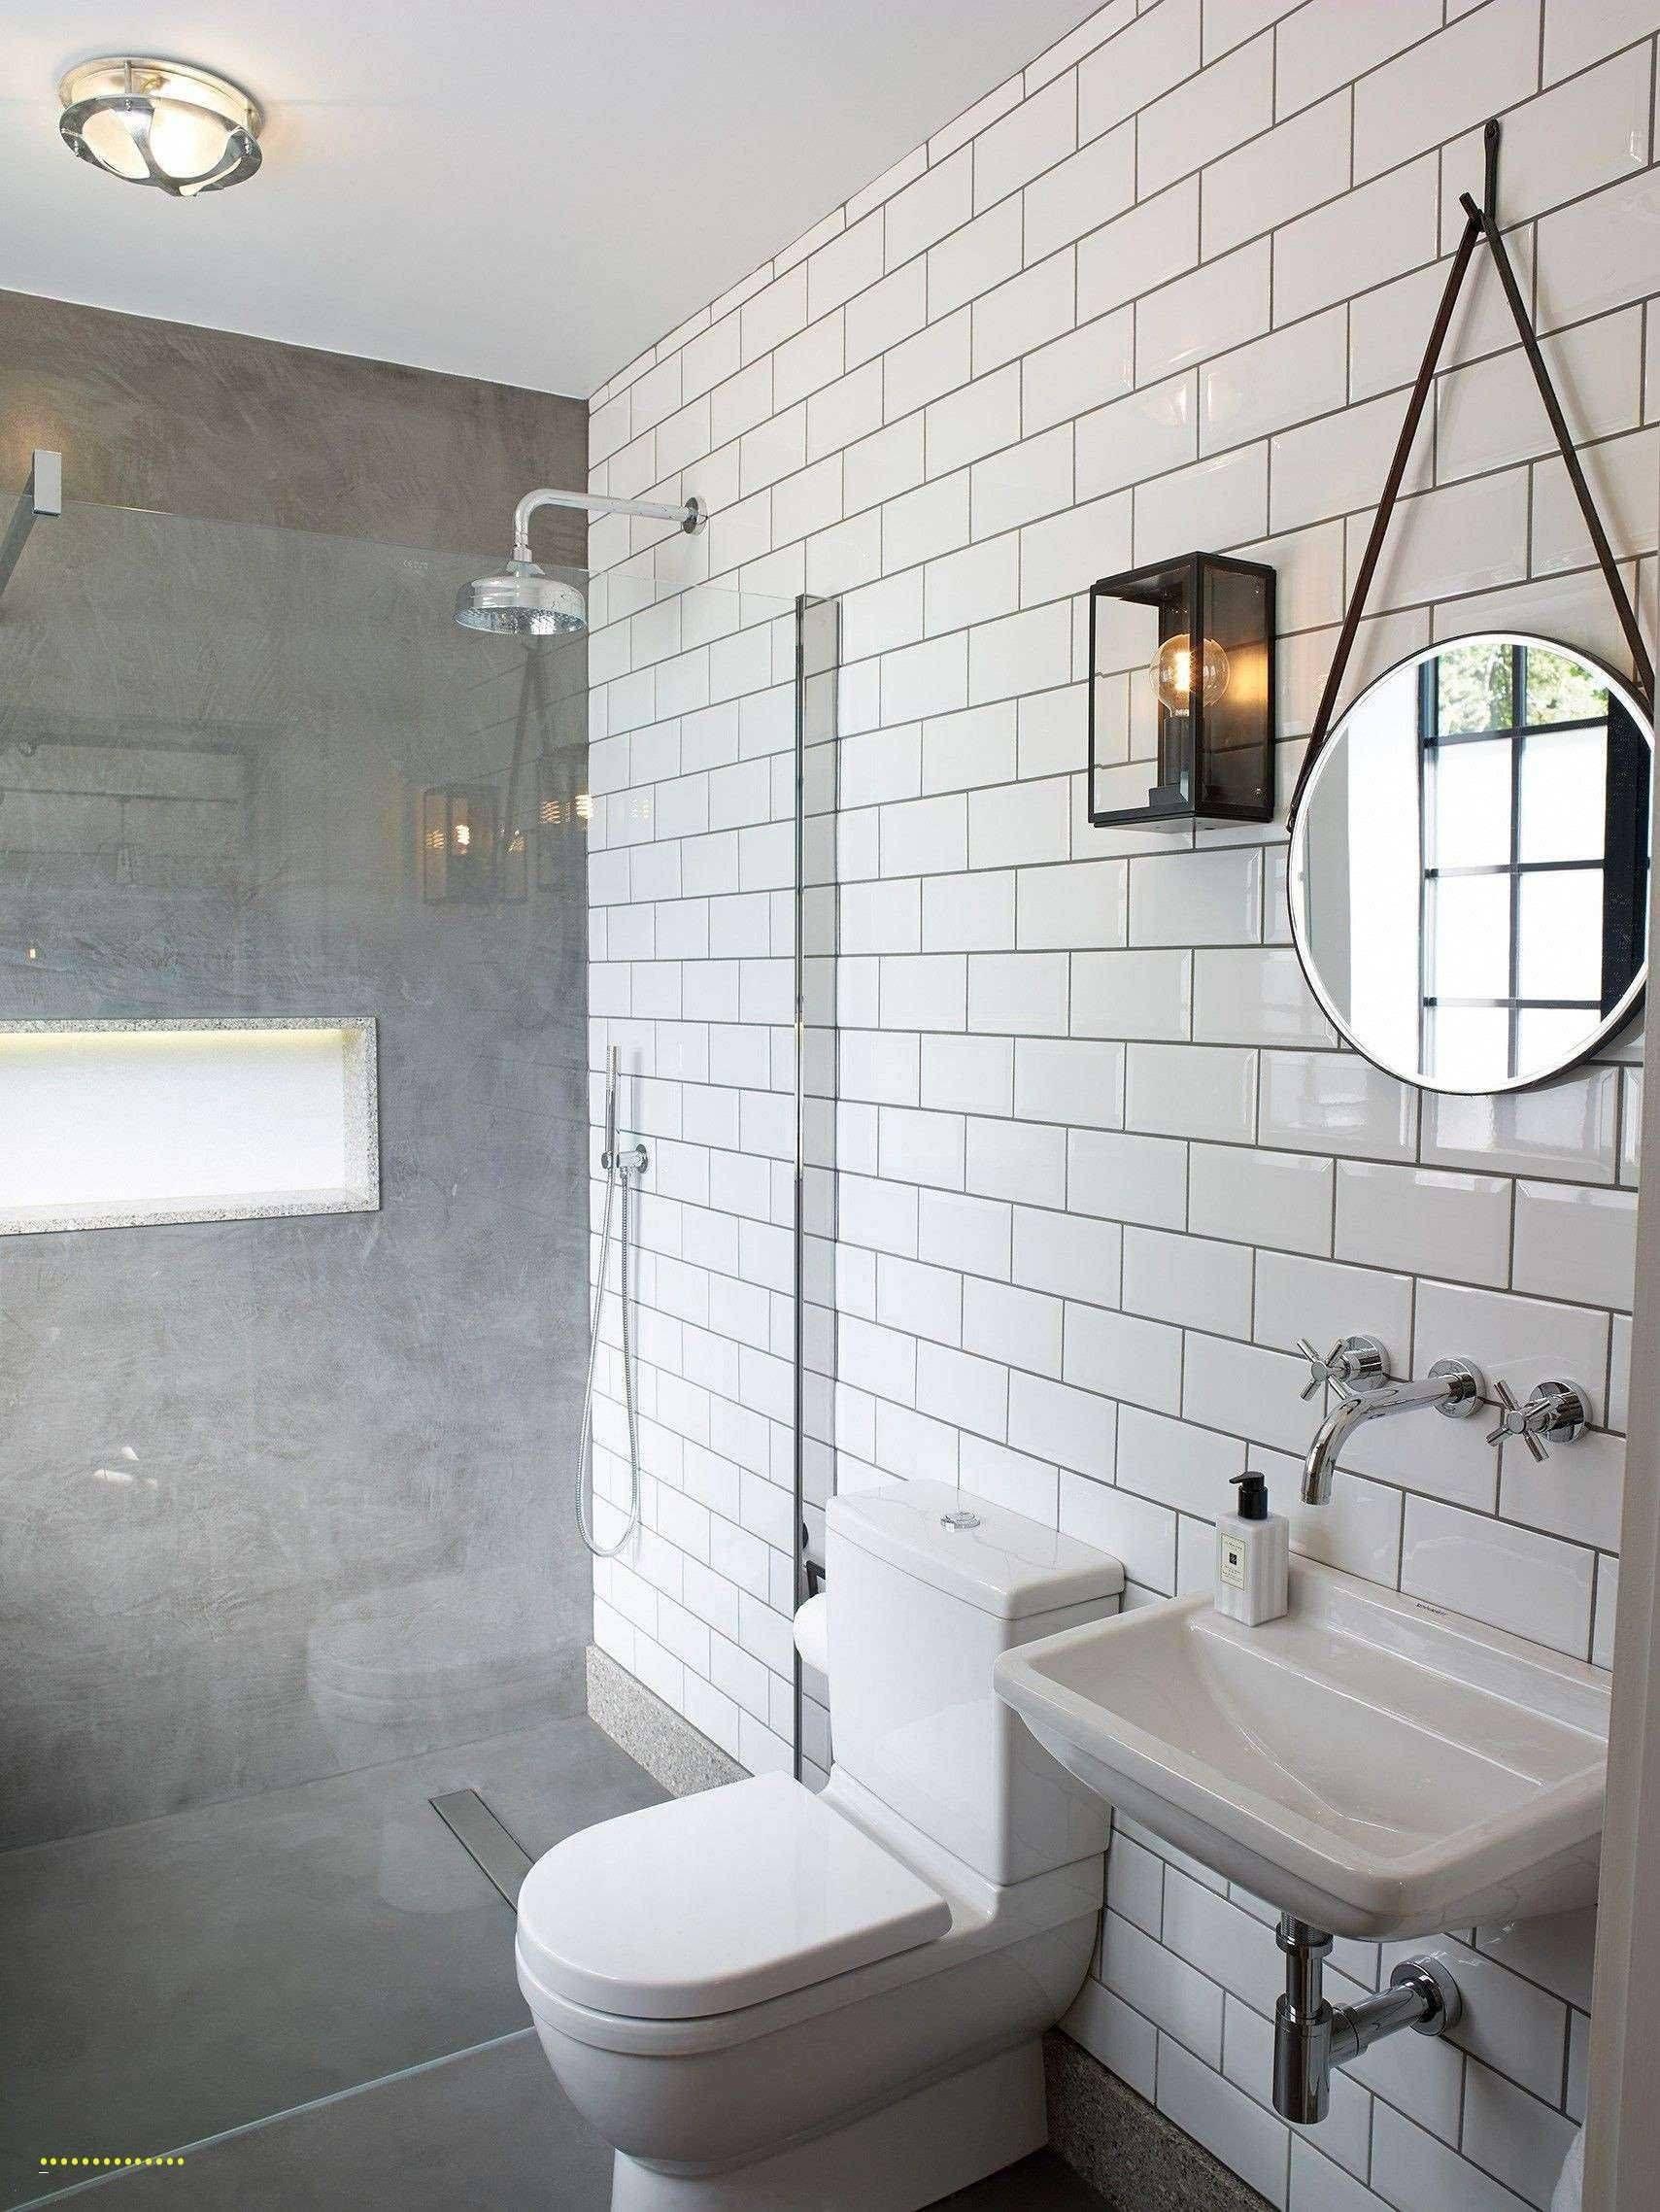 Pinterest Home Decor Bathroom More Image Visite Tile Bathroom Elegant Bathroom Small Bathroom